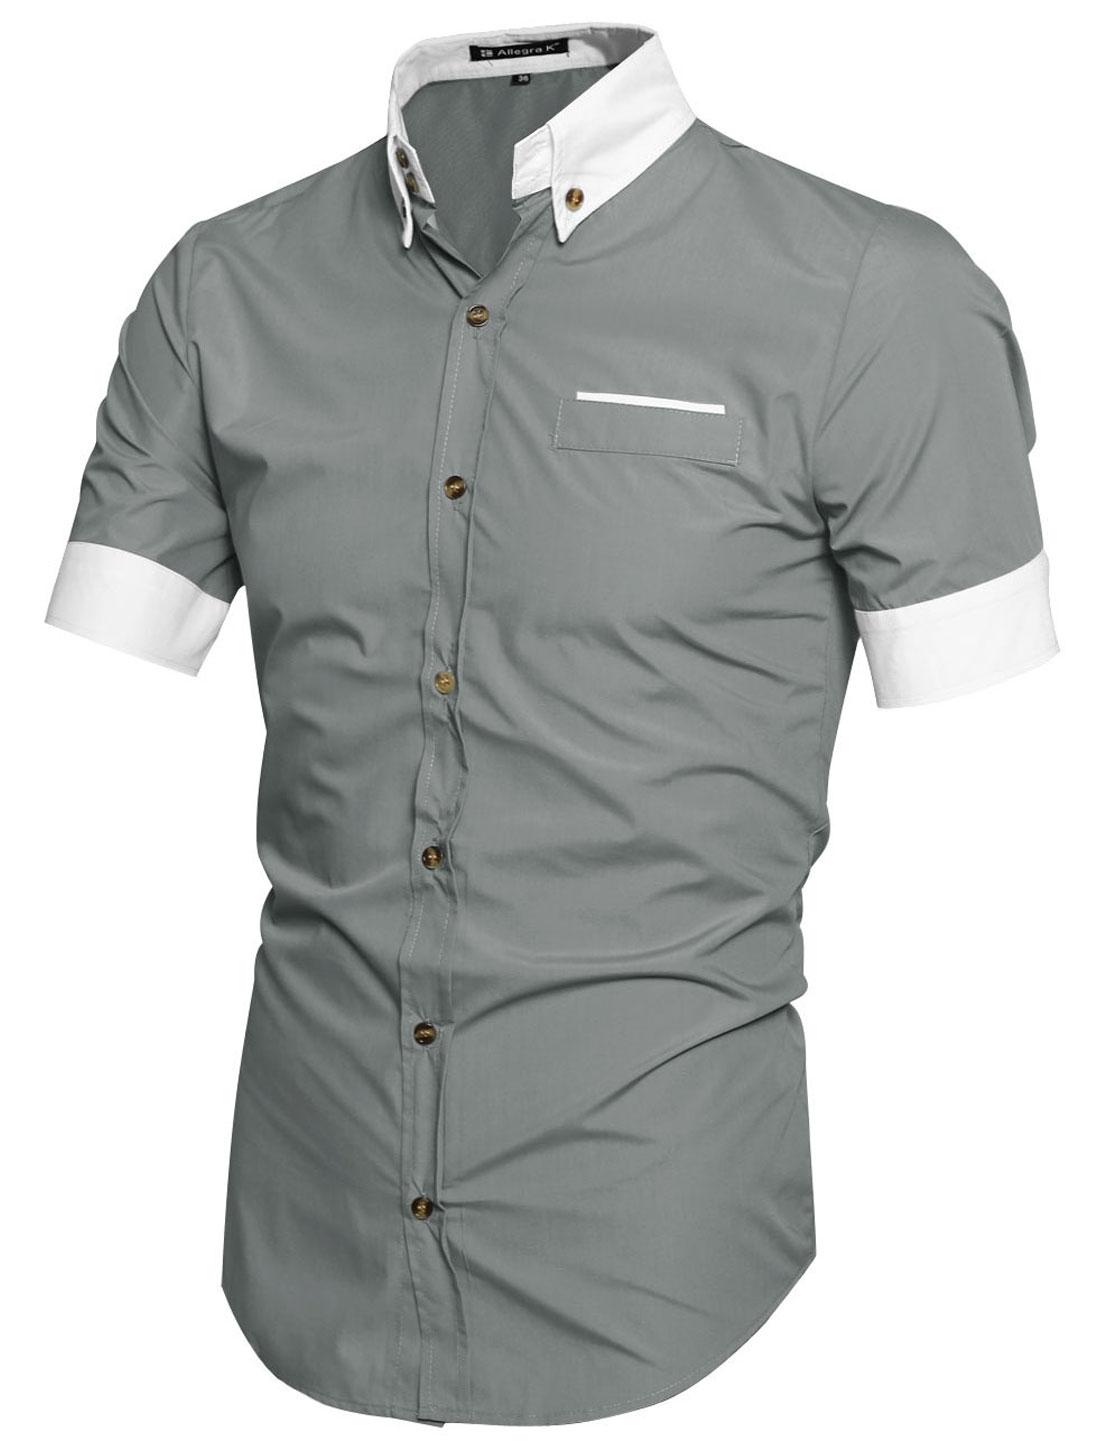 Men Stylish Point Collar Contrast Button Down Short Sleeve Shirt Light Gray L